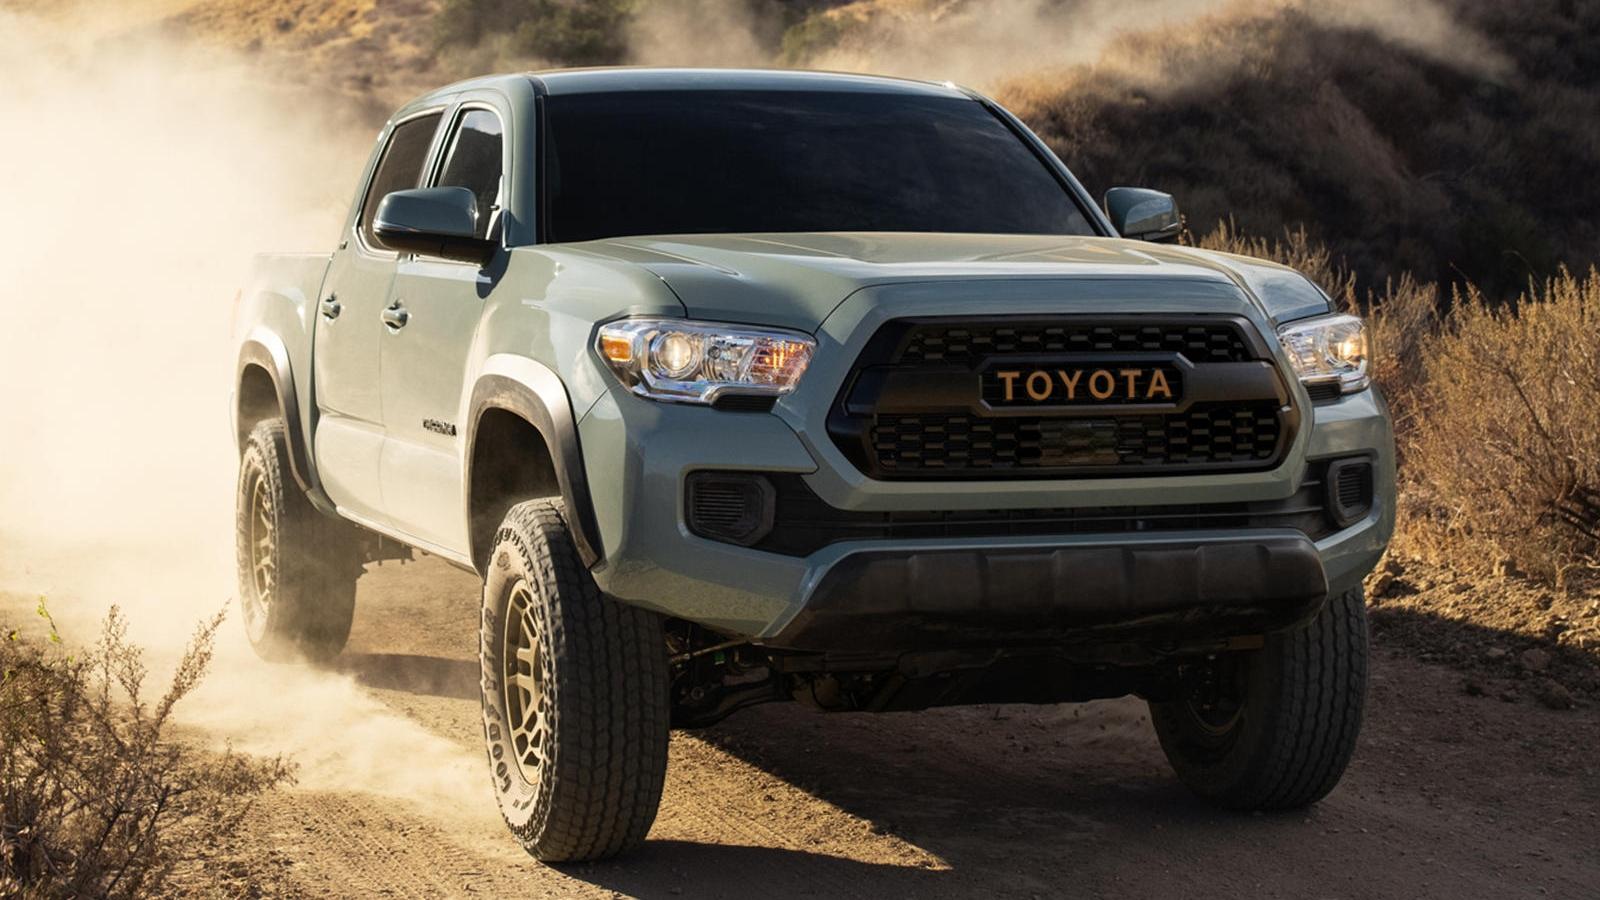 Toyota Tacoma Trail Edition 2022 ra mắt, giá gần 40.000 USD